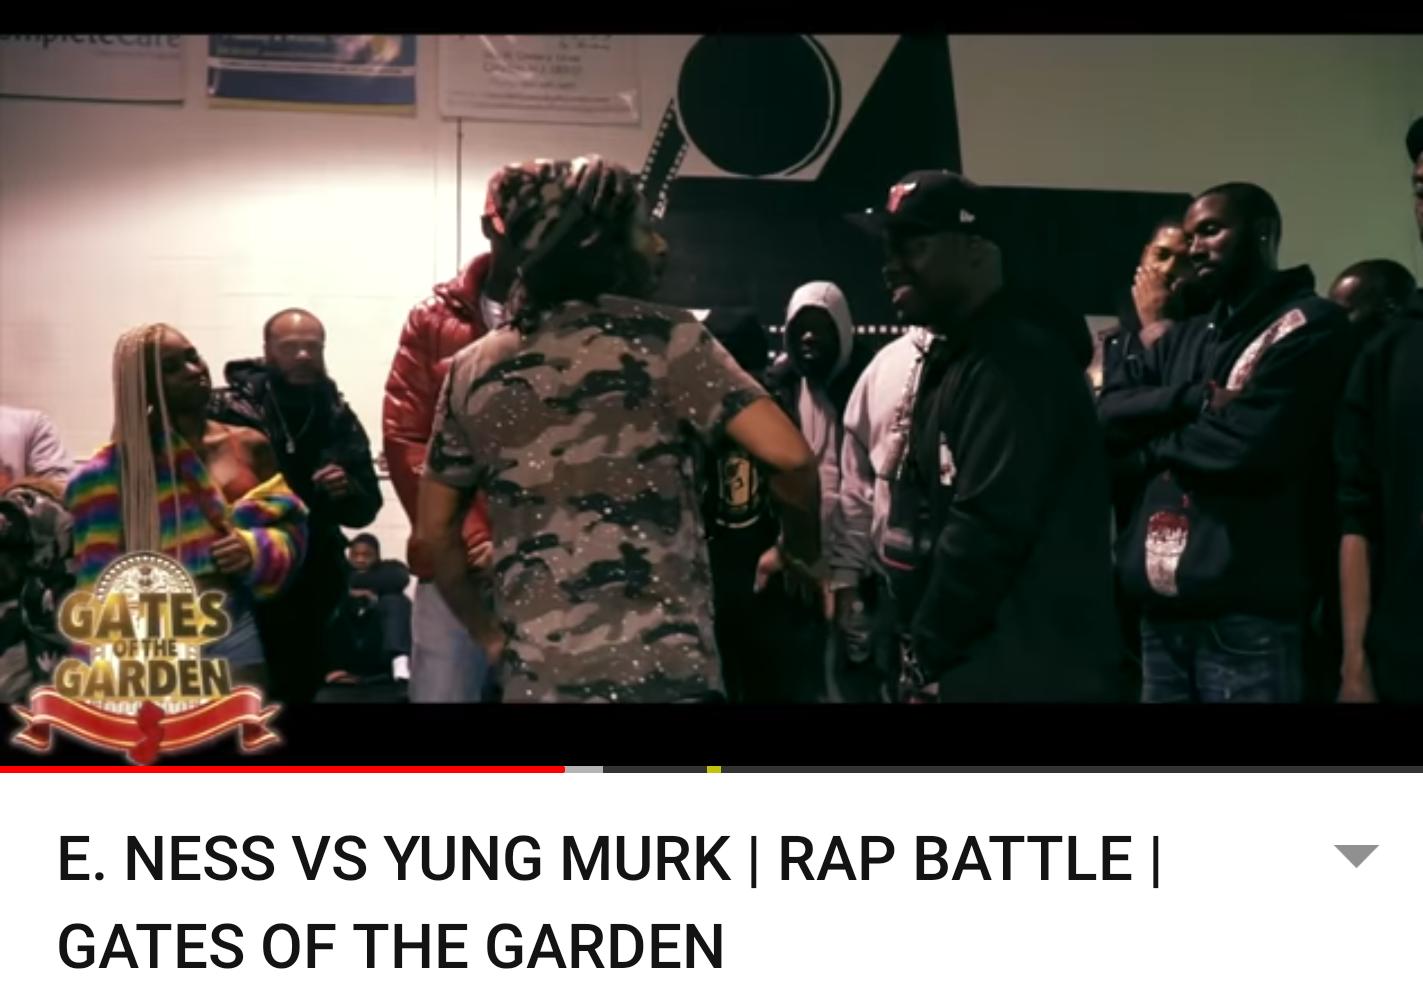 E. NESS VS YUNG MURK | RAP BATTLE | GATES OF THE GARDEN